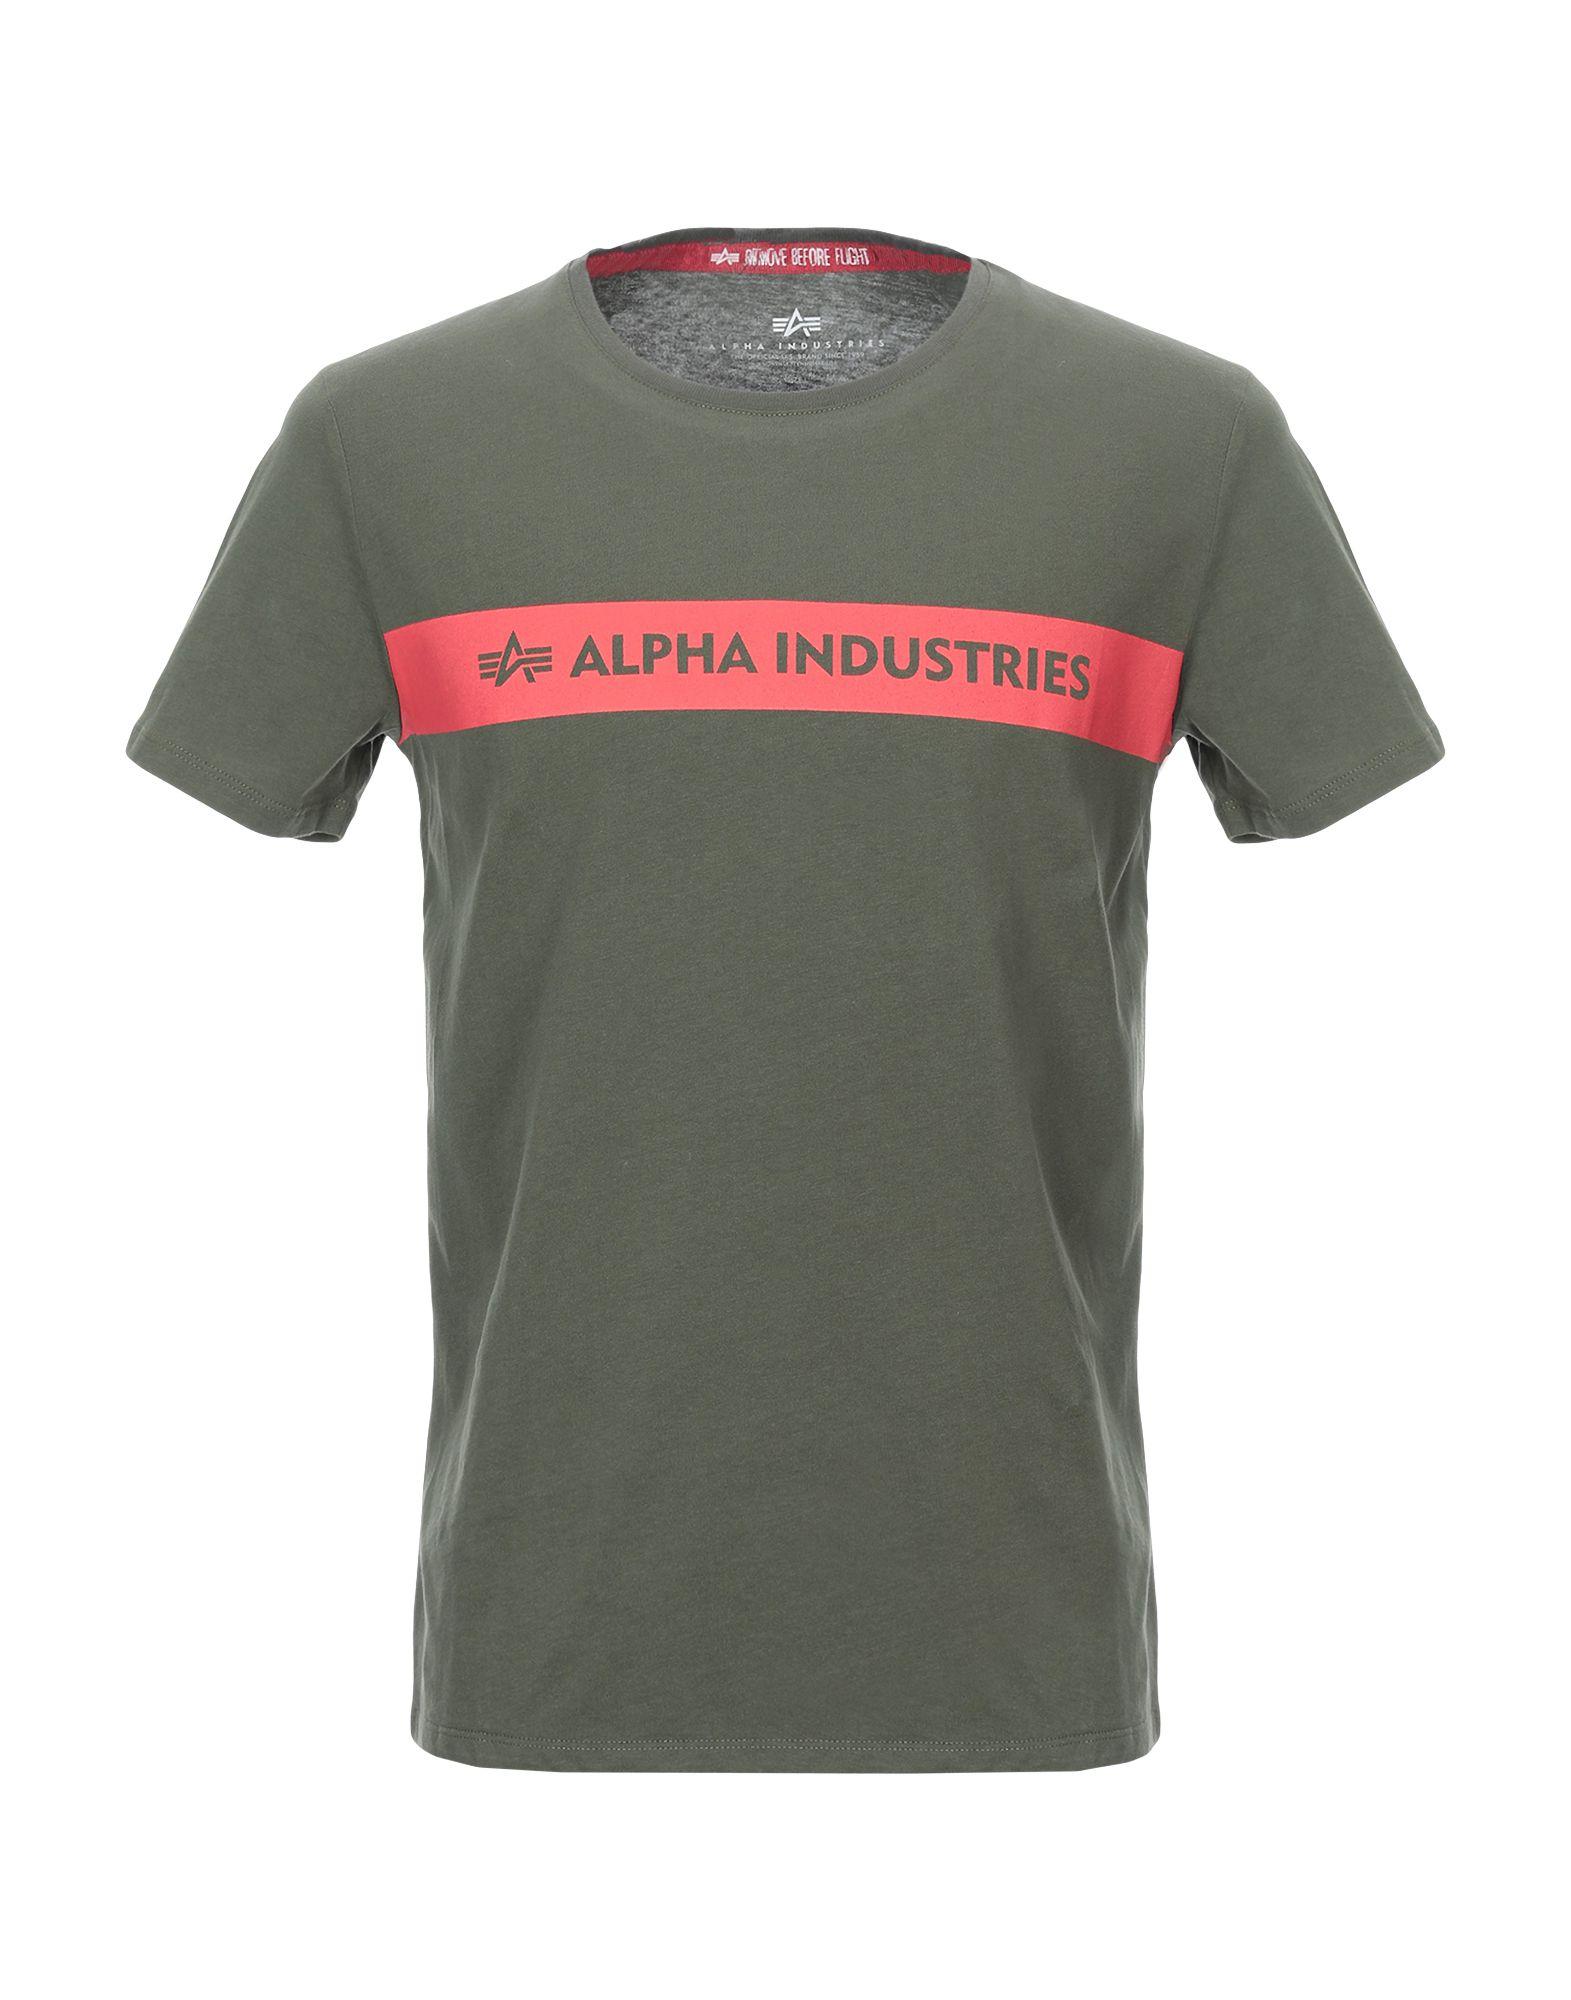 ALPHA INDUSTRIES INC. Футболка bath trans bench g98309g 1 per pack by medline industries inc